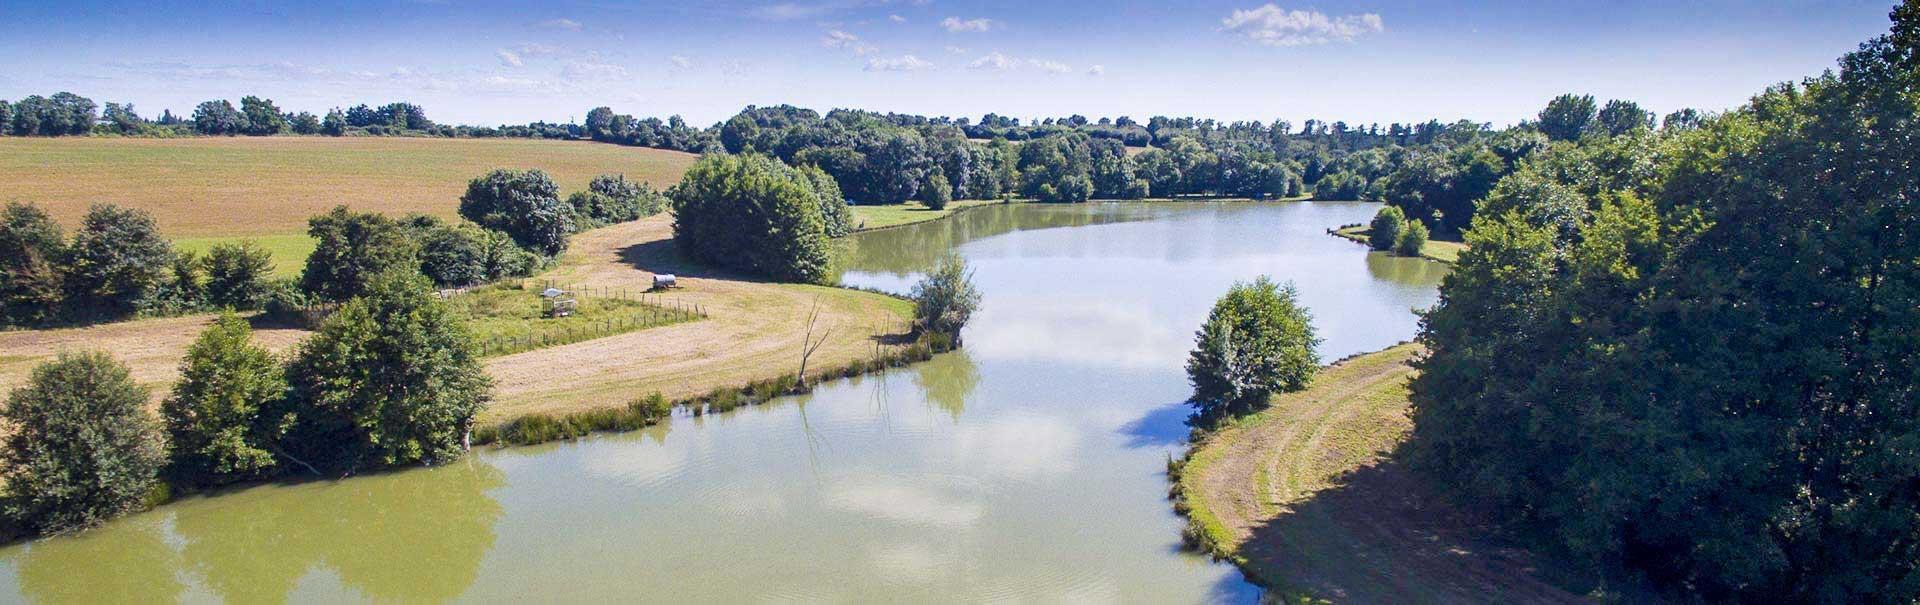 Village des Rulières - Camping *** Fontenay-le-Comte